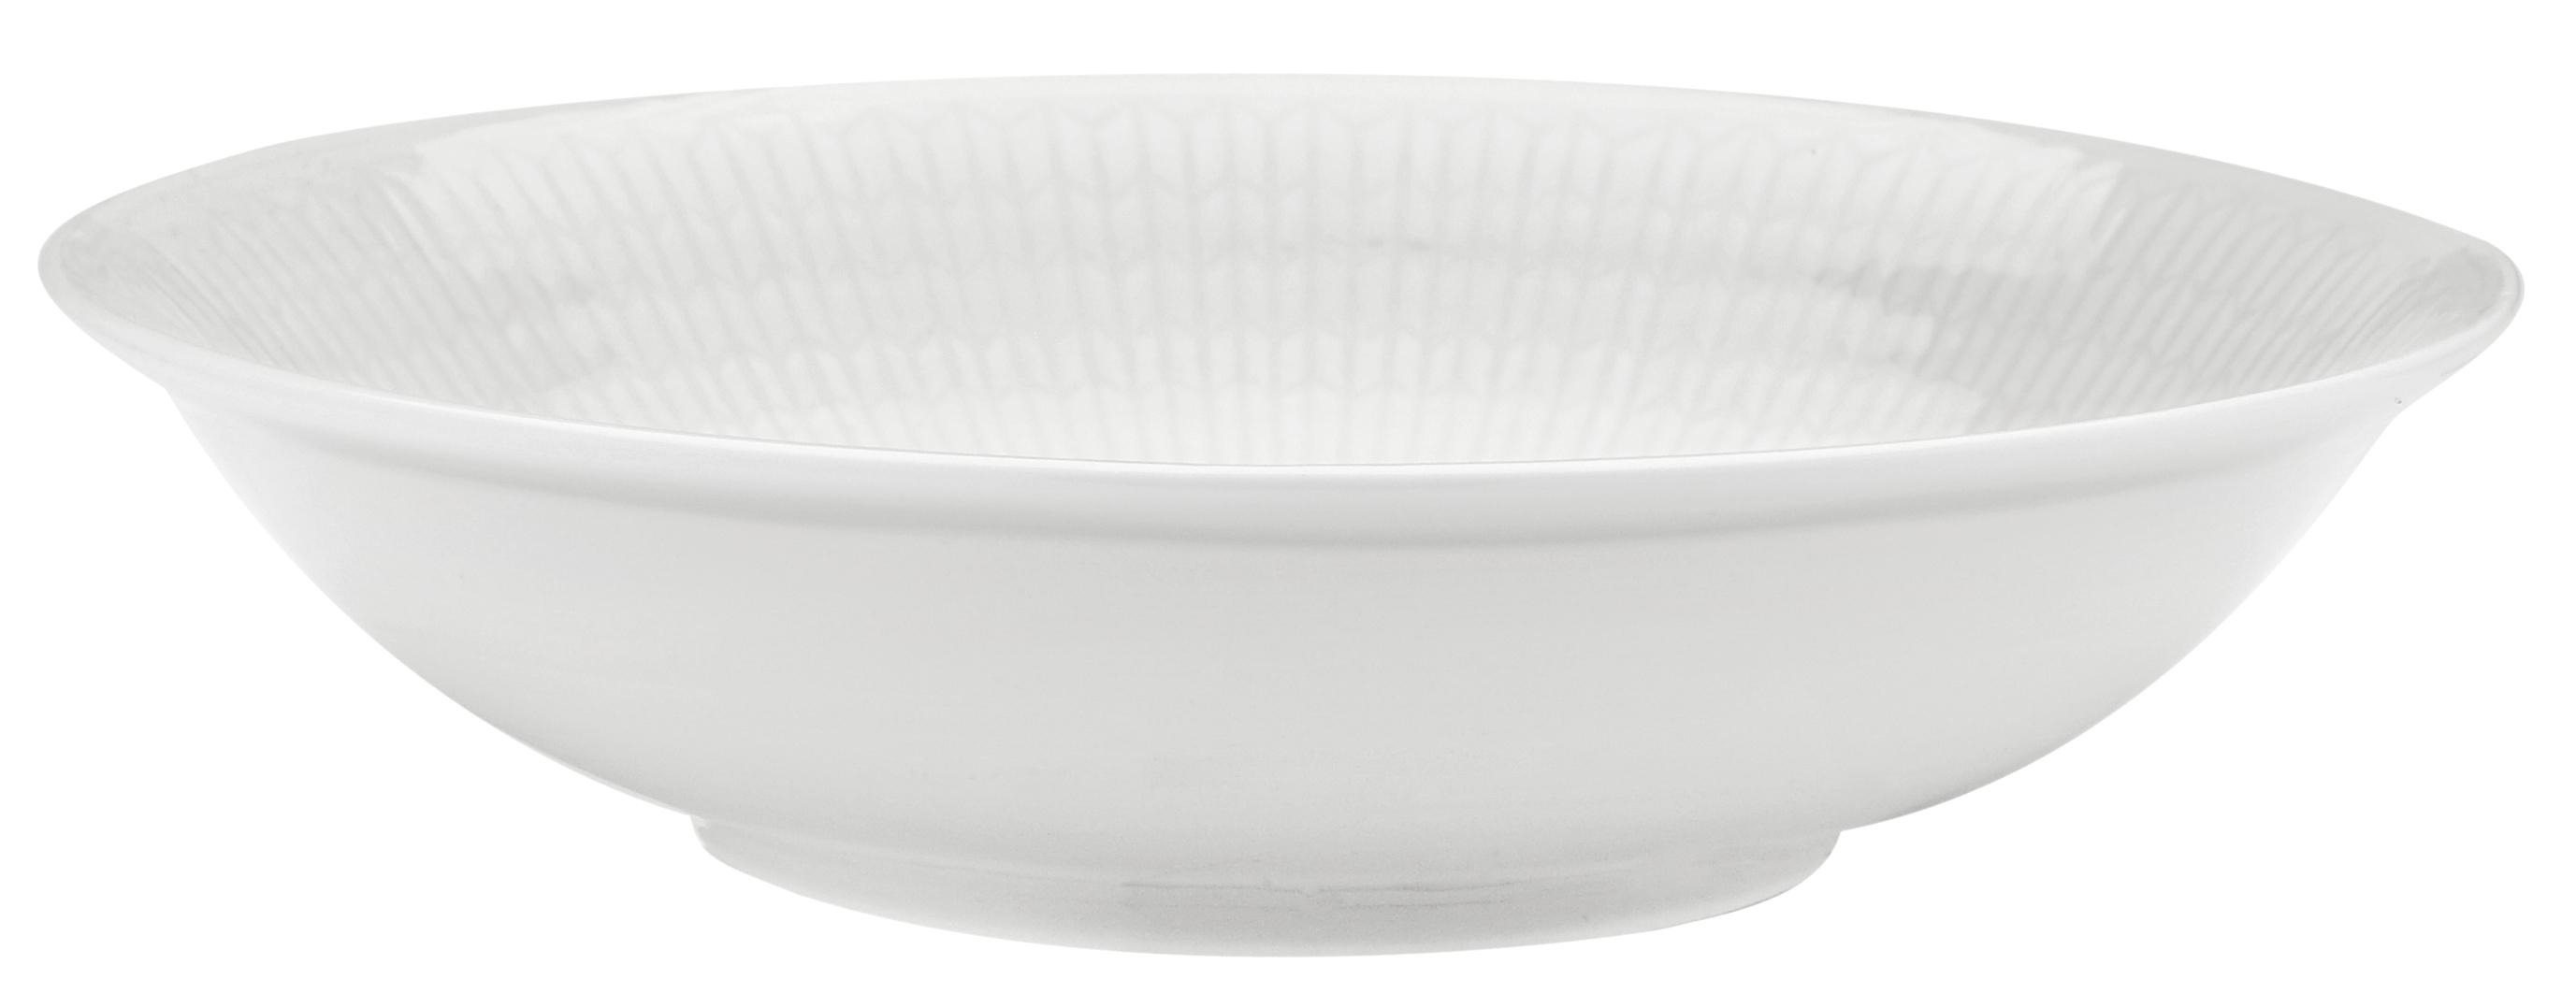 Rörstrand Swedish Grace Snö Tallrik djup 19 cm